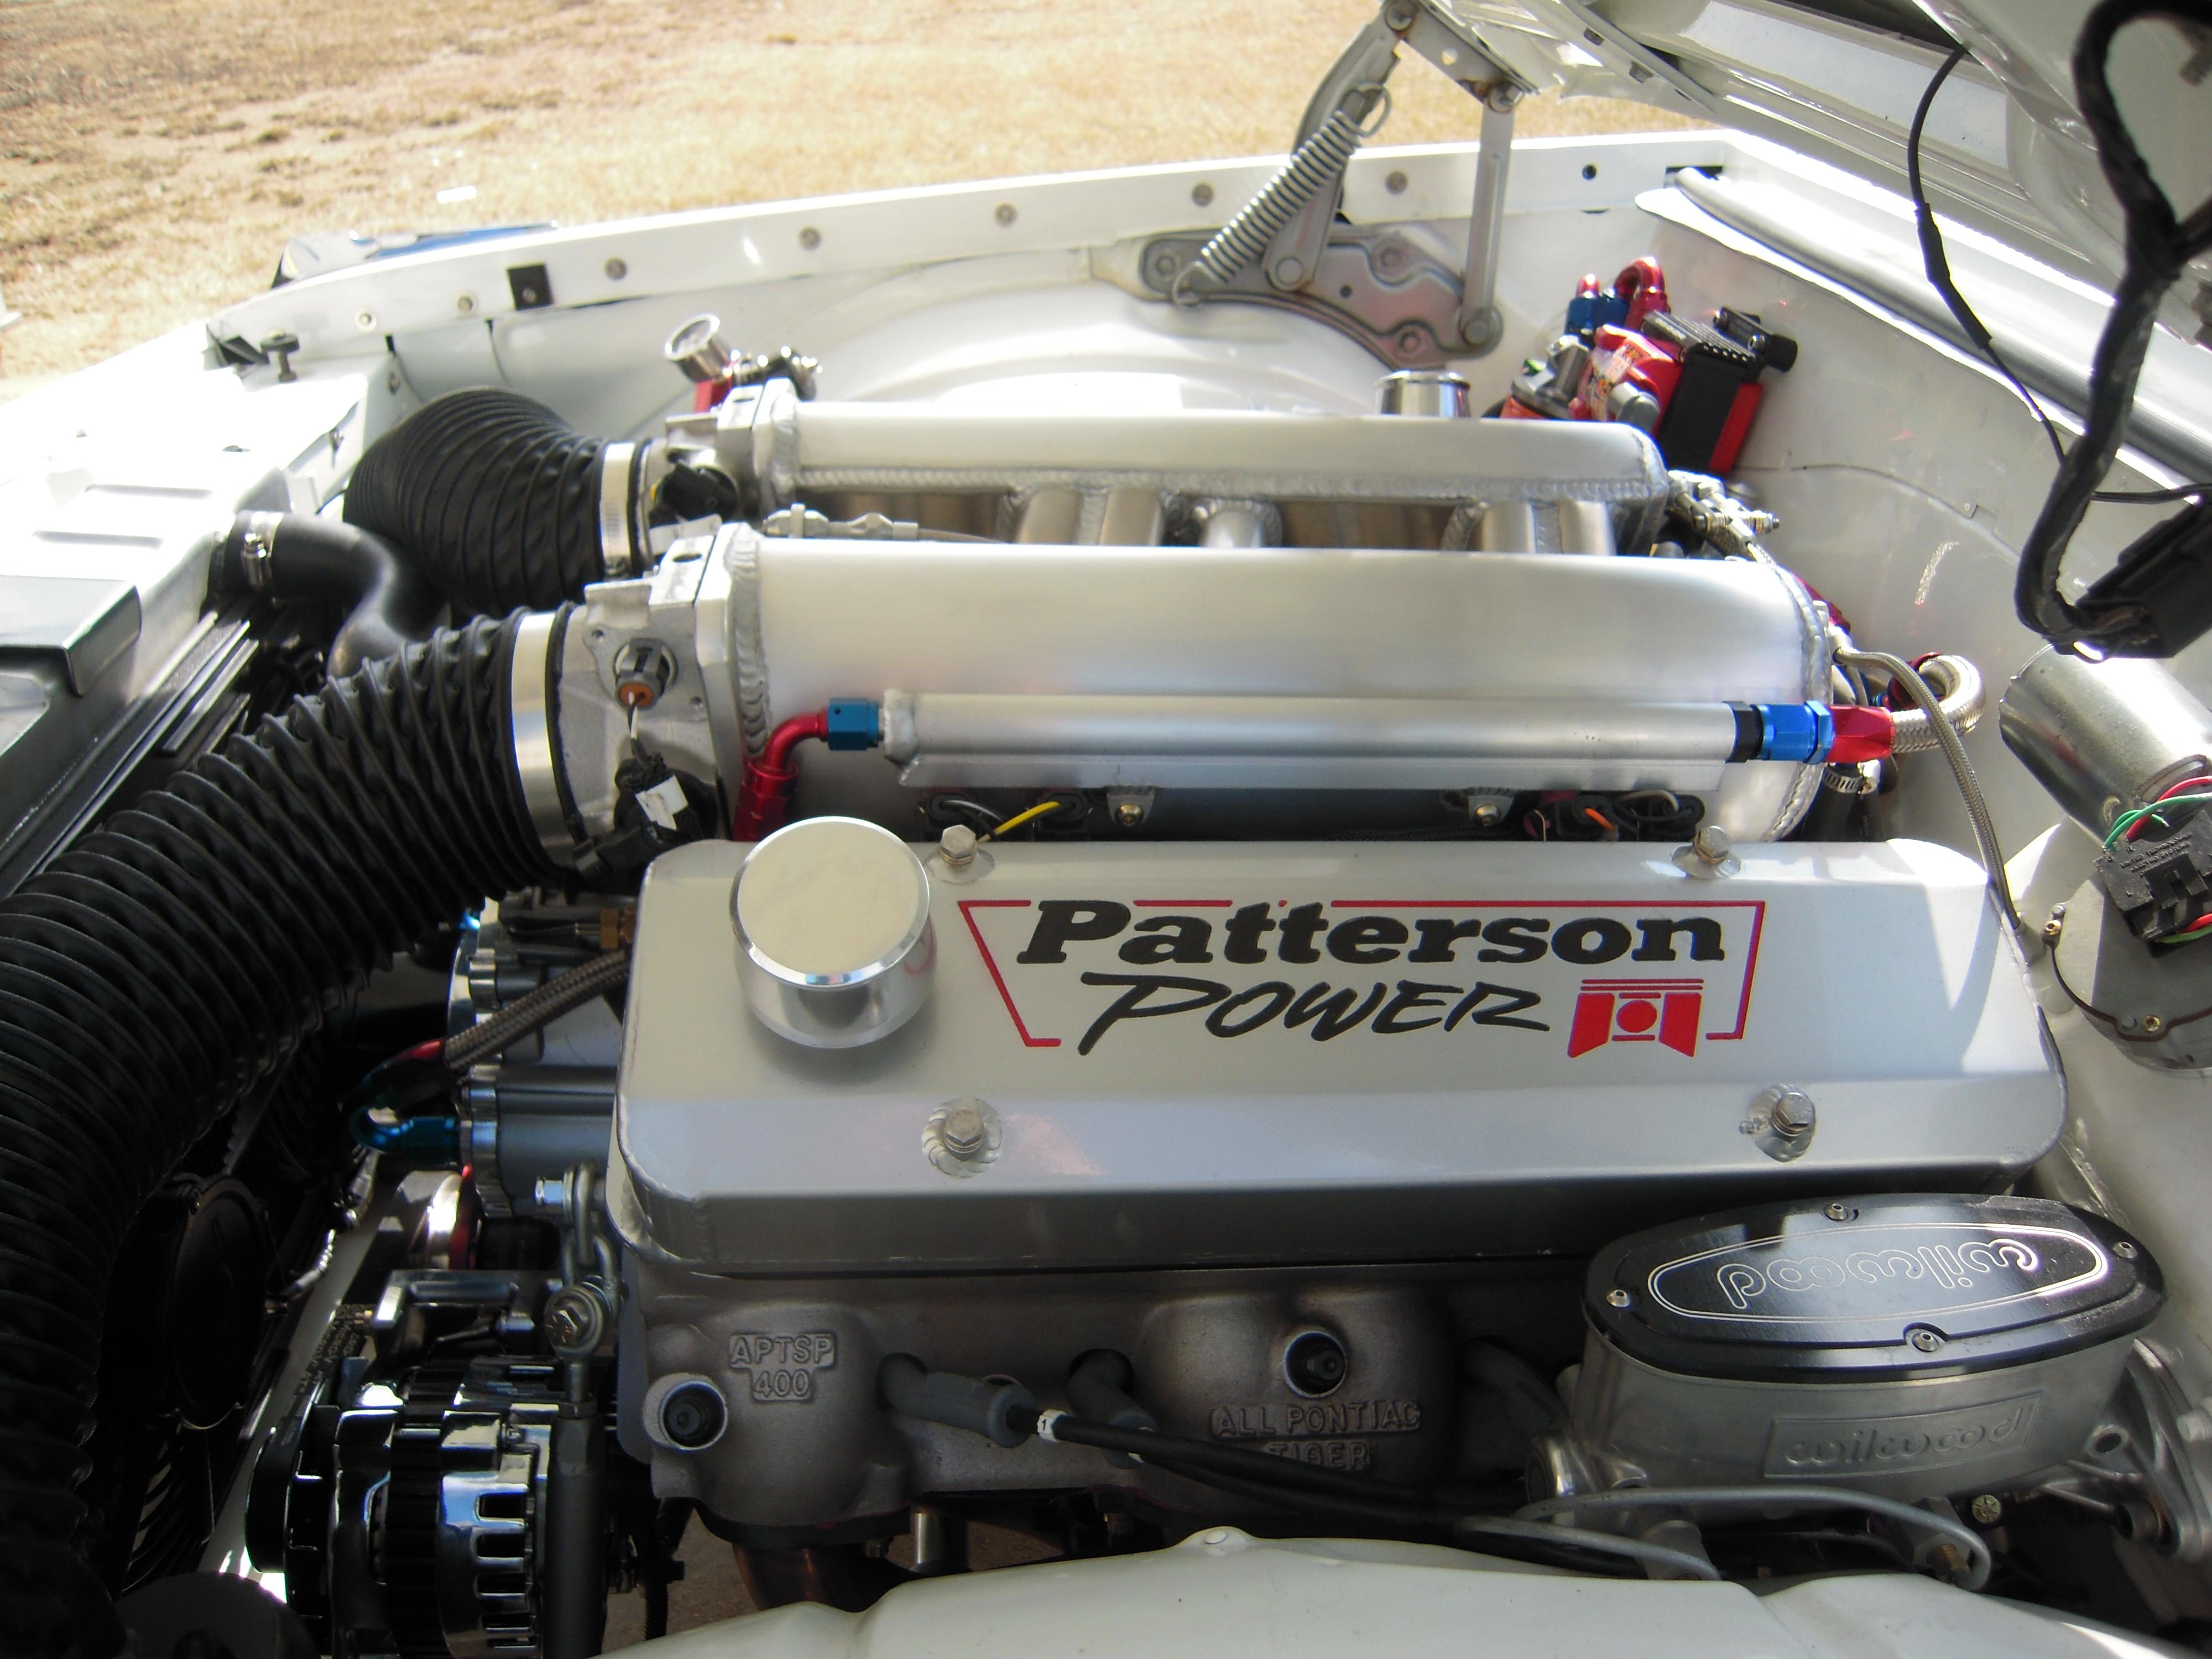 535-cubic-inch-pontiac-drag-racing-motor.jpg